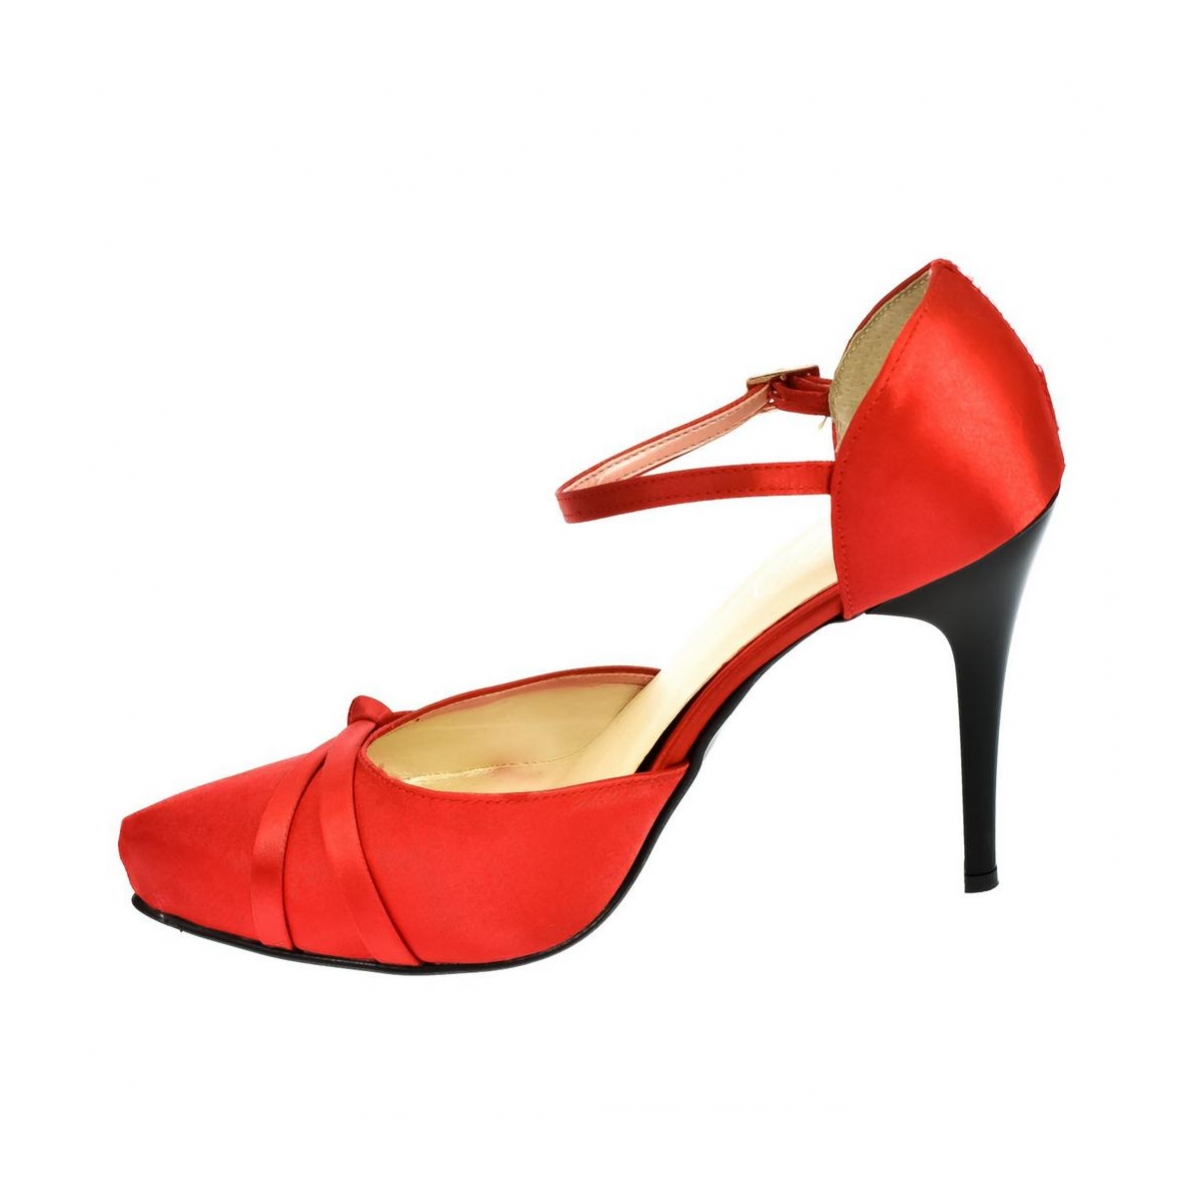 78ff93d6159b Dámske červené sandále PEBLINII P70 - 5